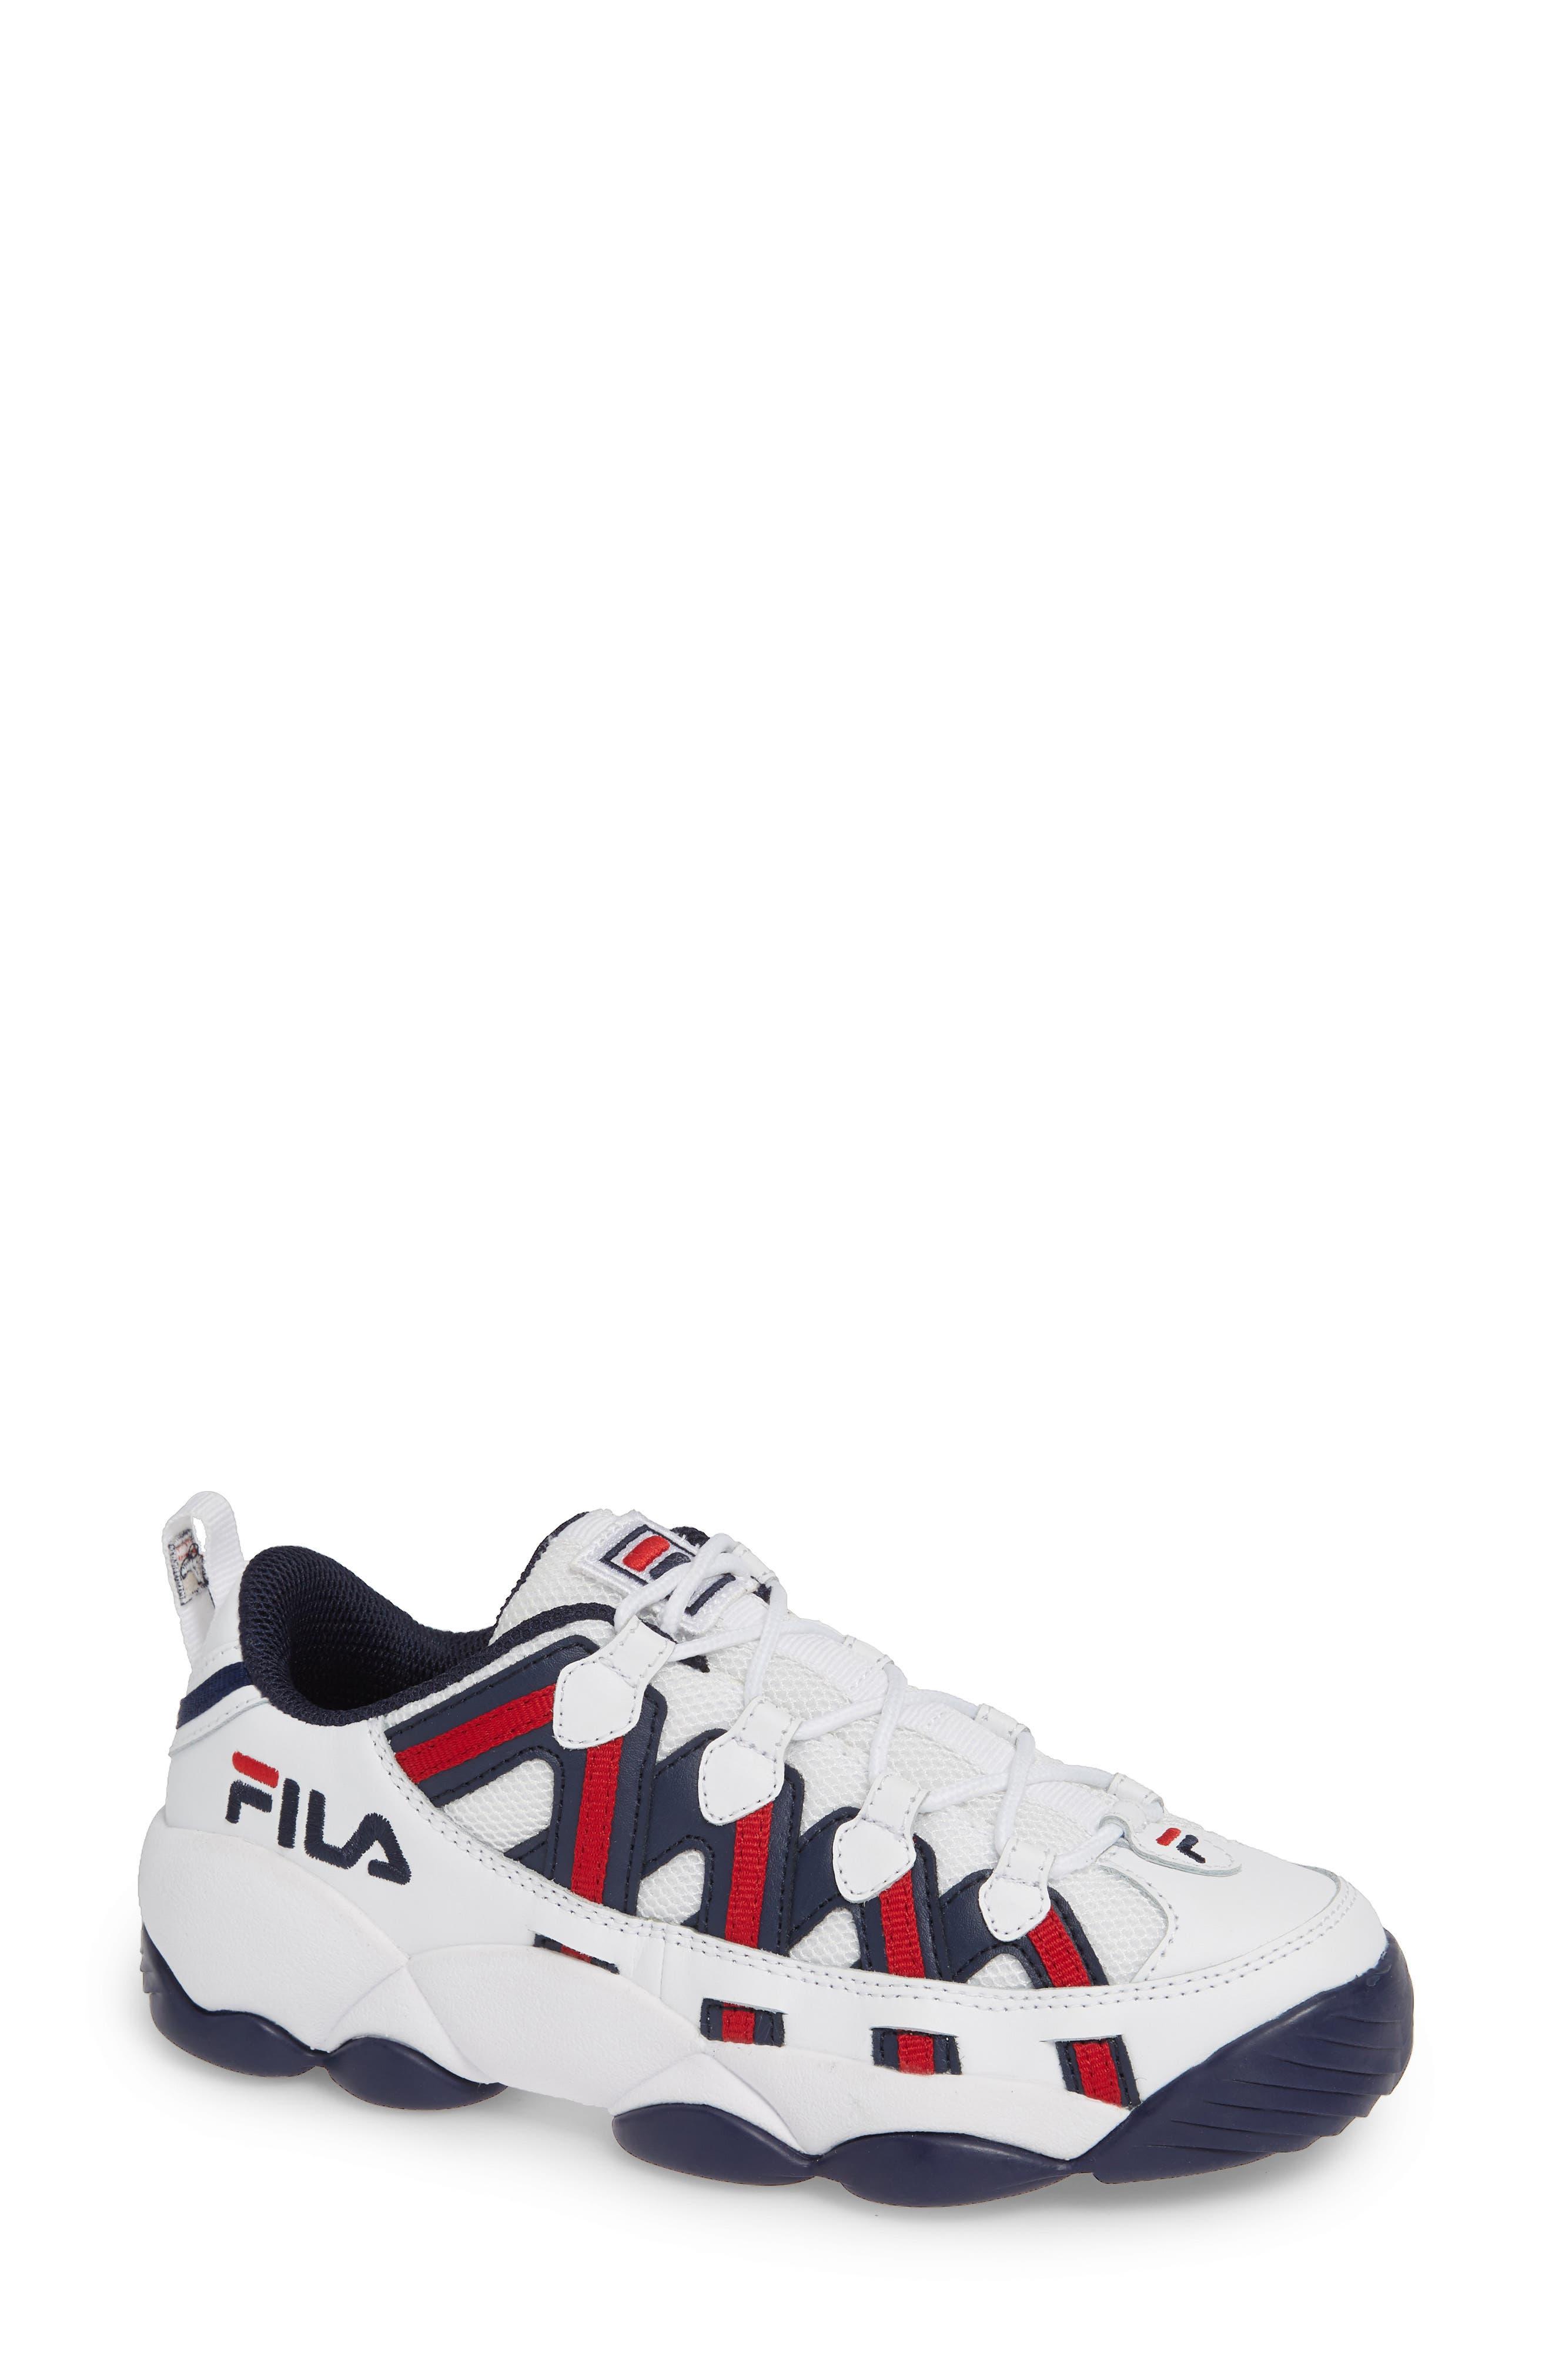 FILA Spaghetti Low Sneaker, Main, color, WHITE/ FILA NAVY/ FILA RED